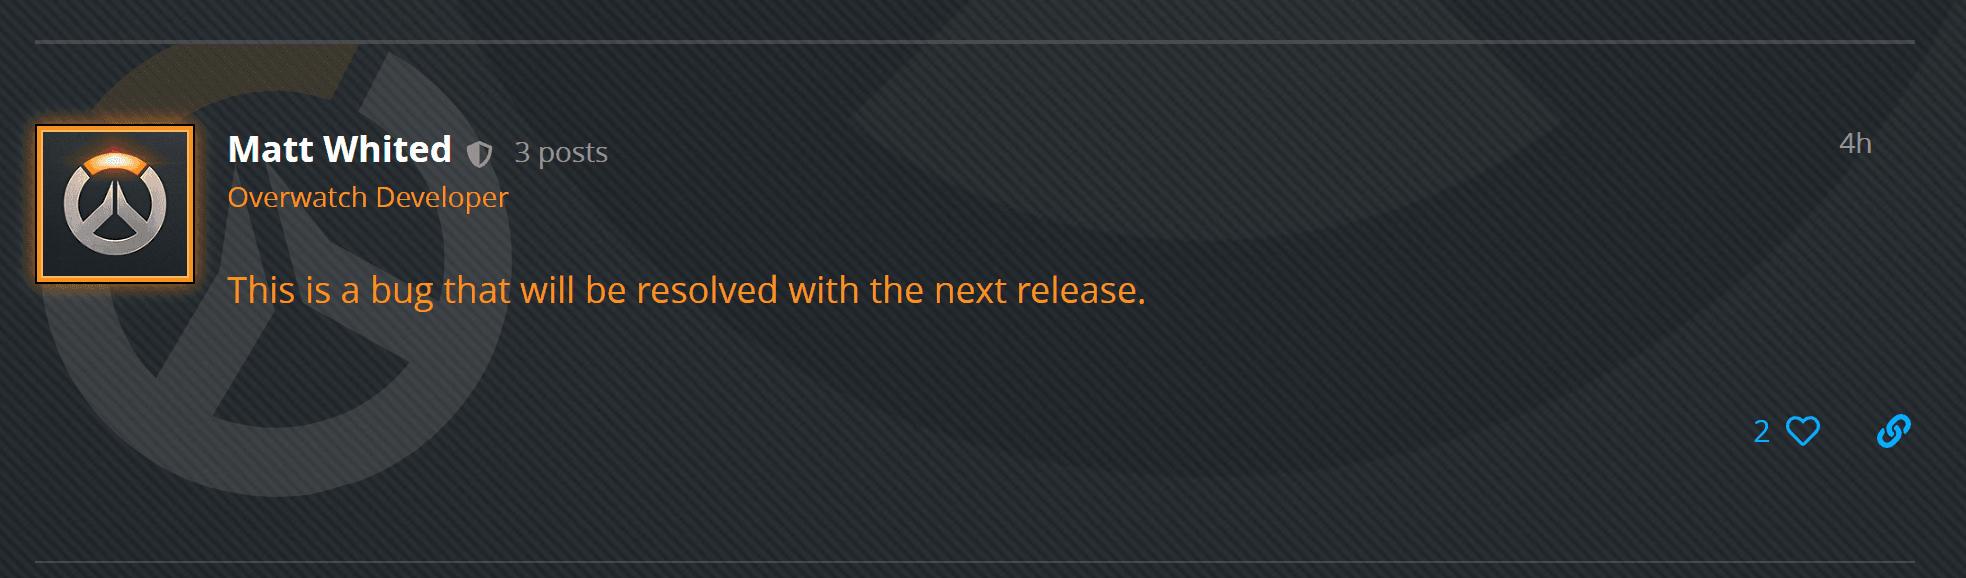 Forum Blizzard Matt Whited